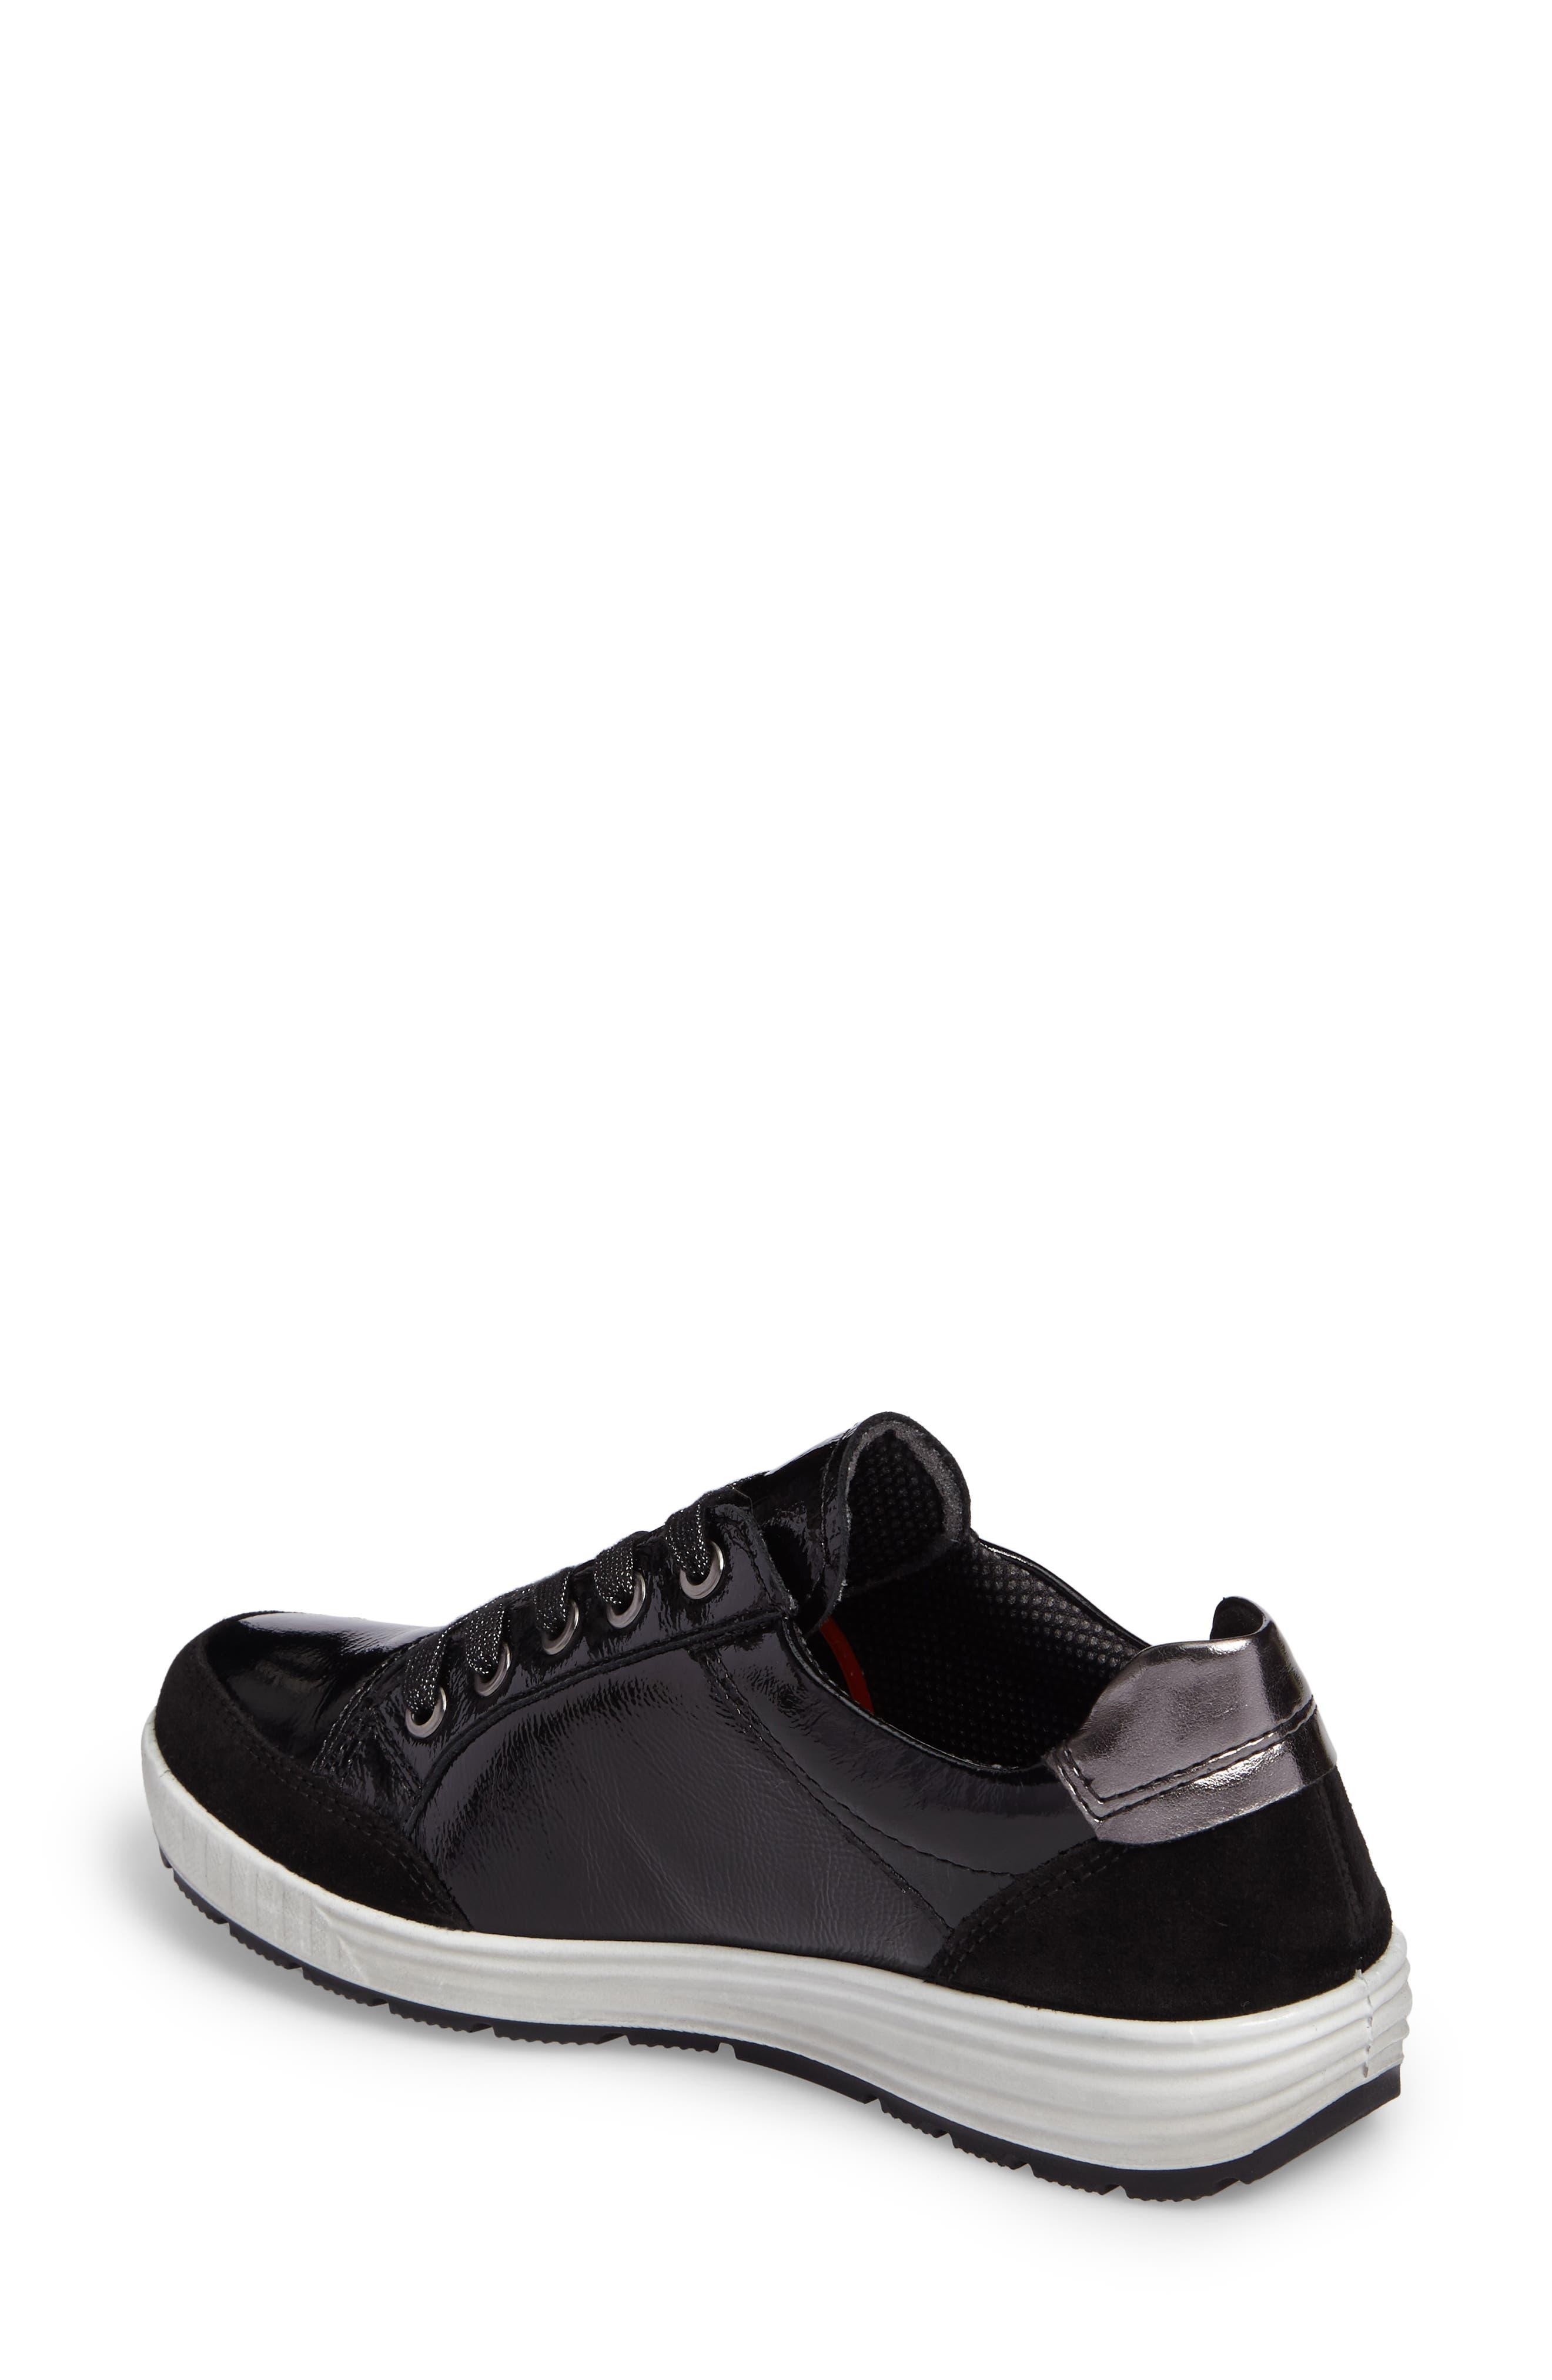 Nicole Sneaker,                             Alternate thumbnail 2, color,                             Black Leather